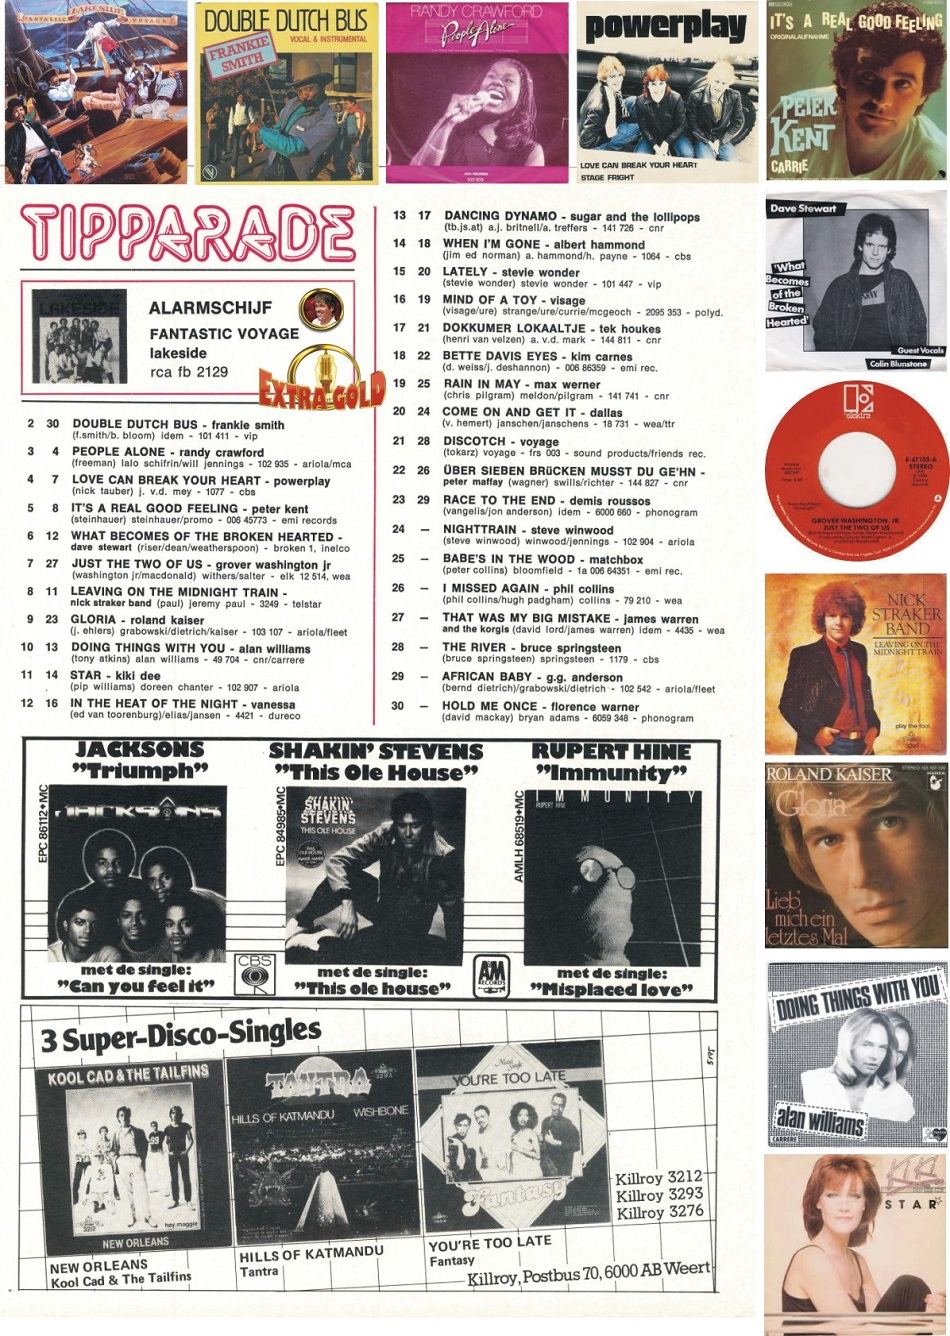 foute jaren 80 muziek lijst